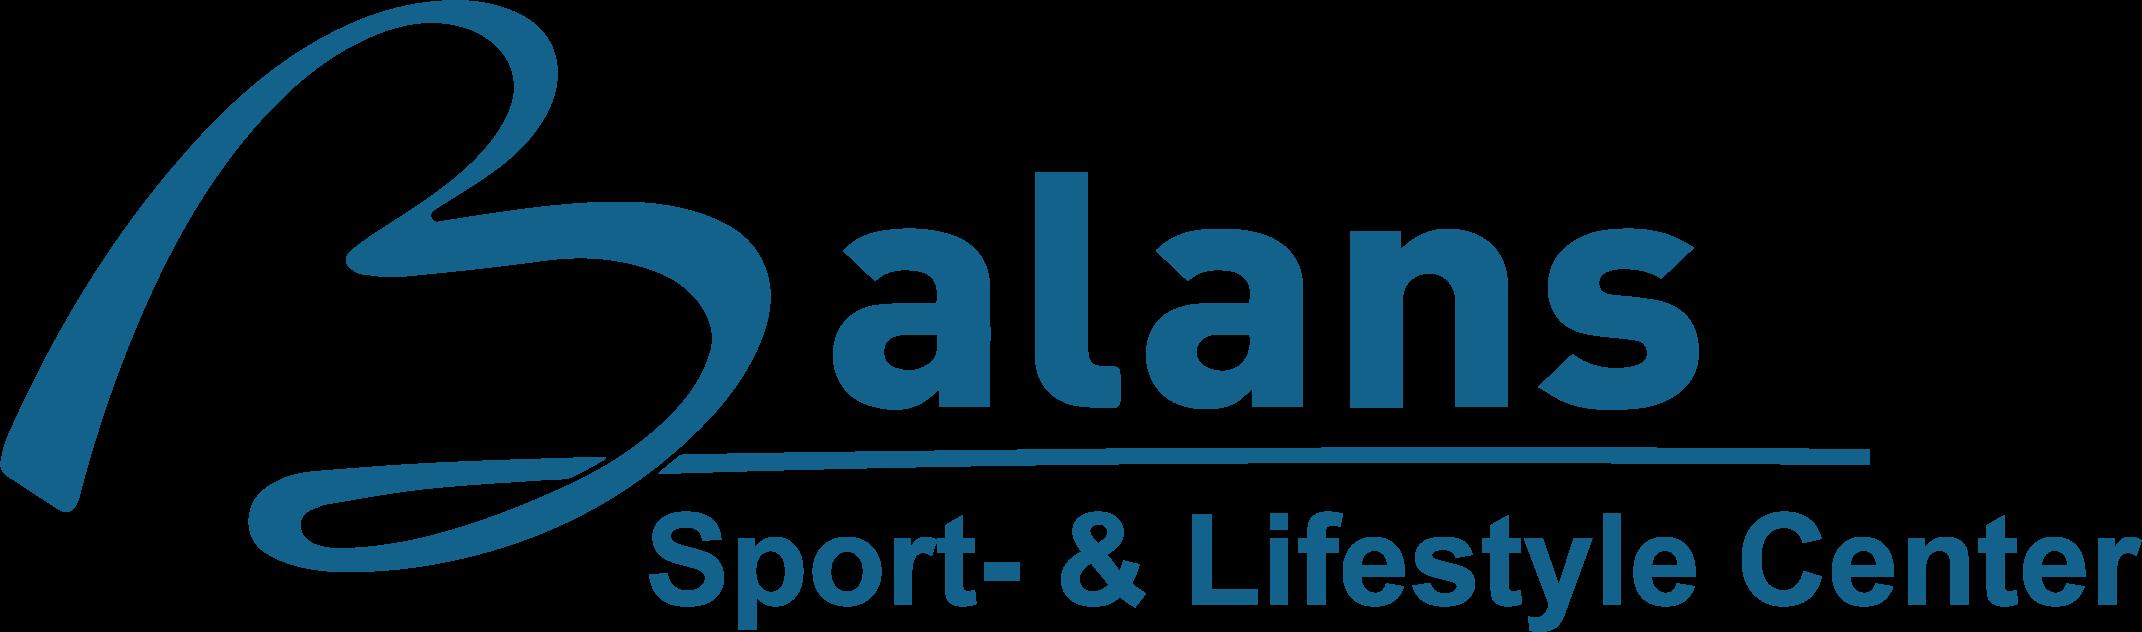 Sport- & Lifestyle Center Balans